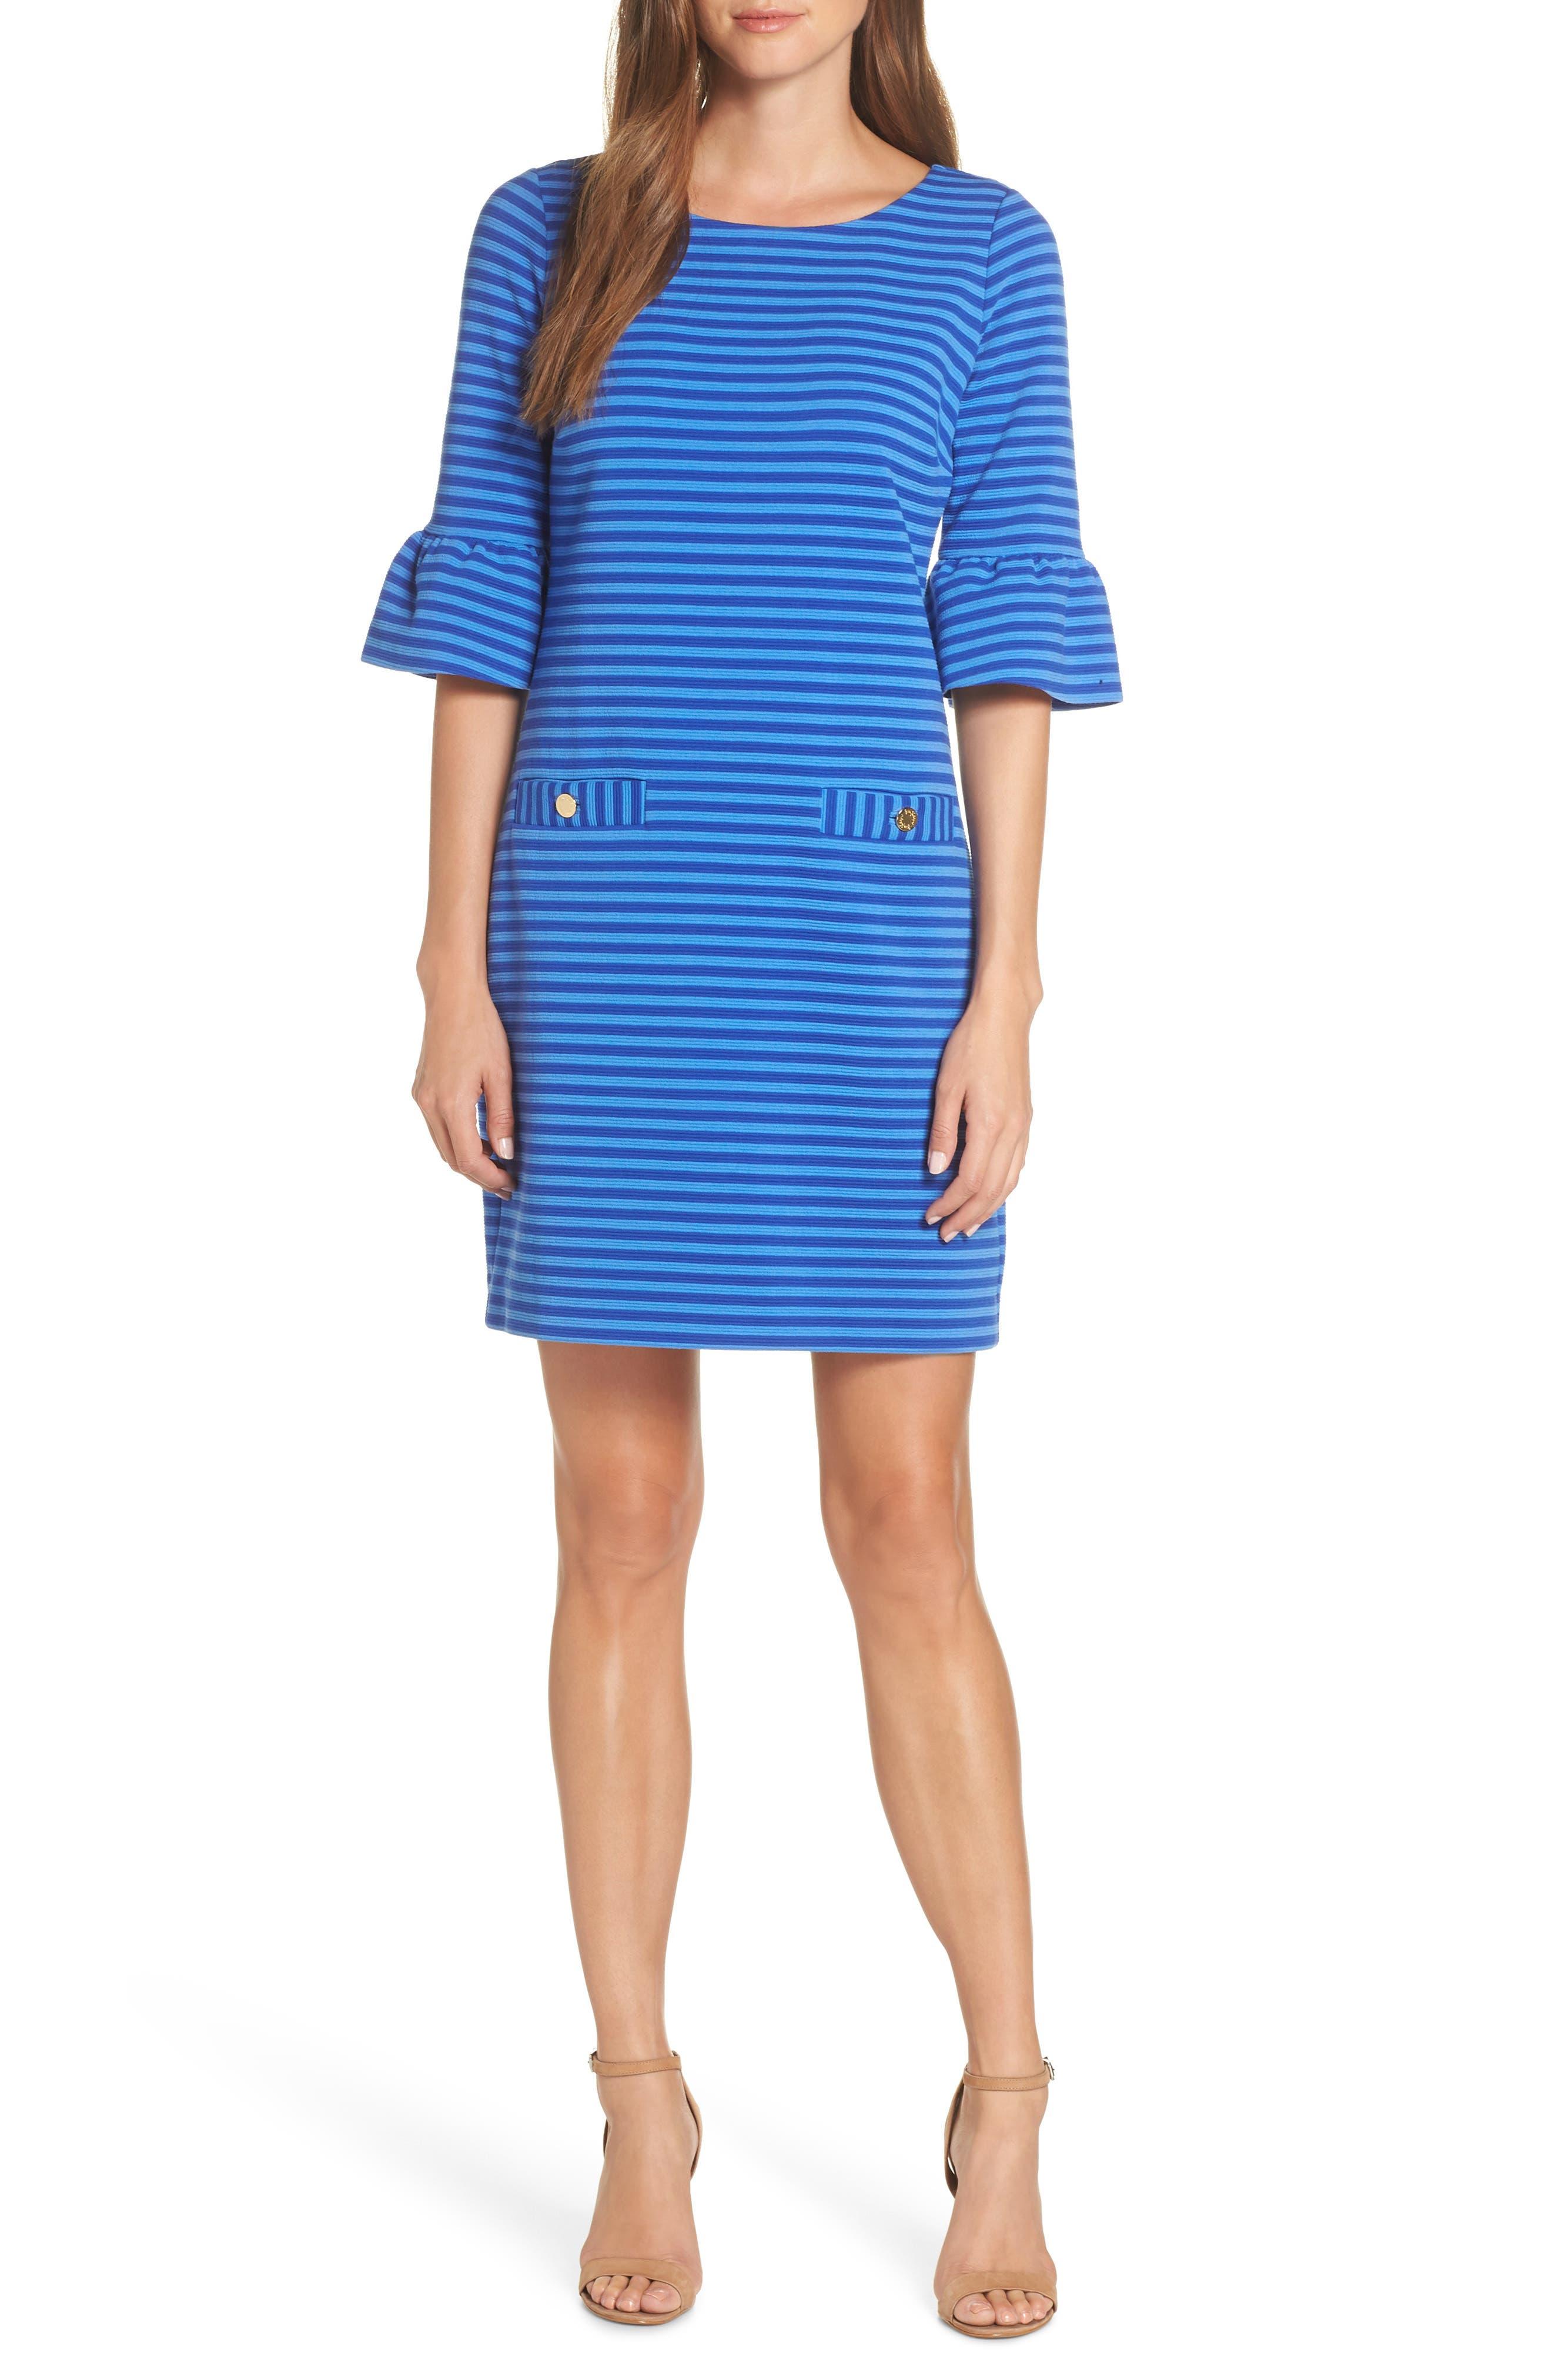 Lilly Pulitzer Alden Stripe Ottoman Shift Dress, Blue